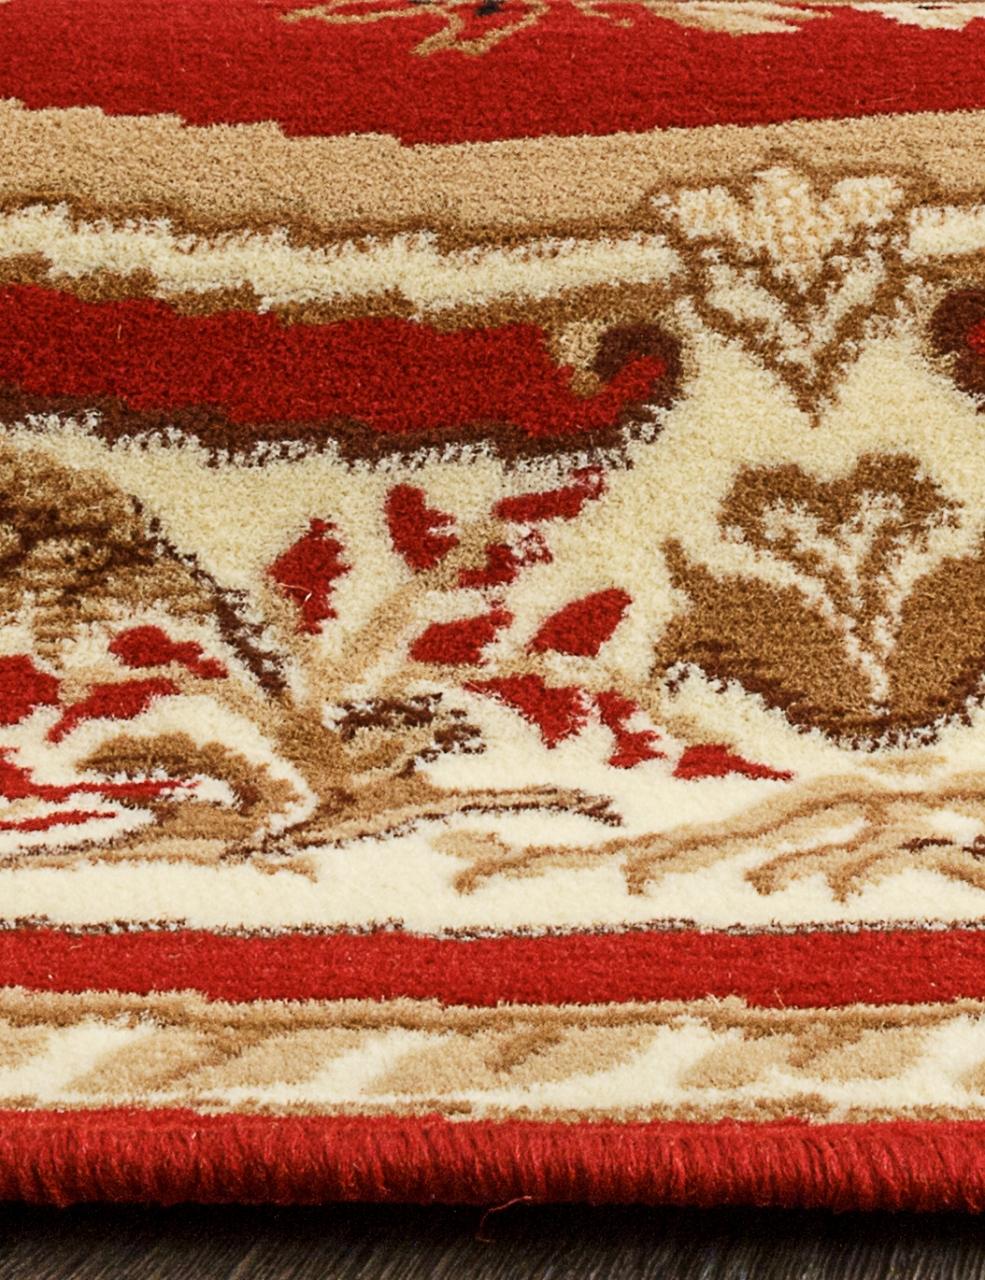 Ковер 5602 - RED - Овал - коллекция LAGUNA - фото 4